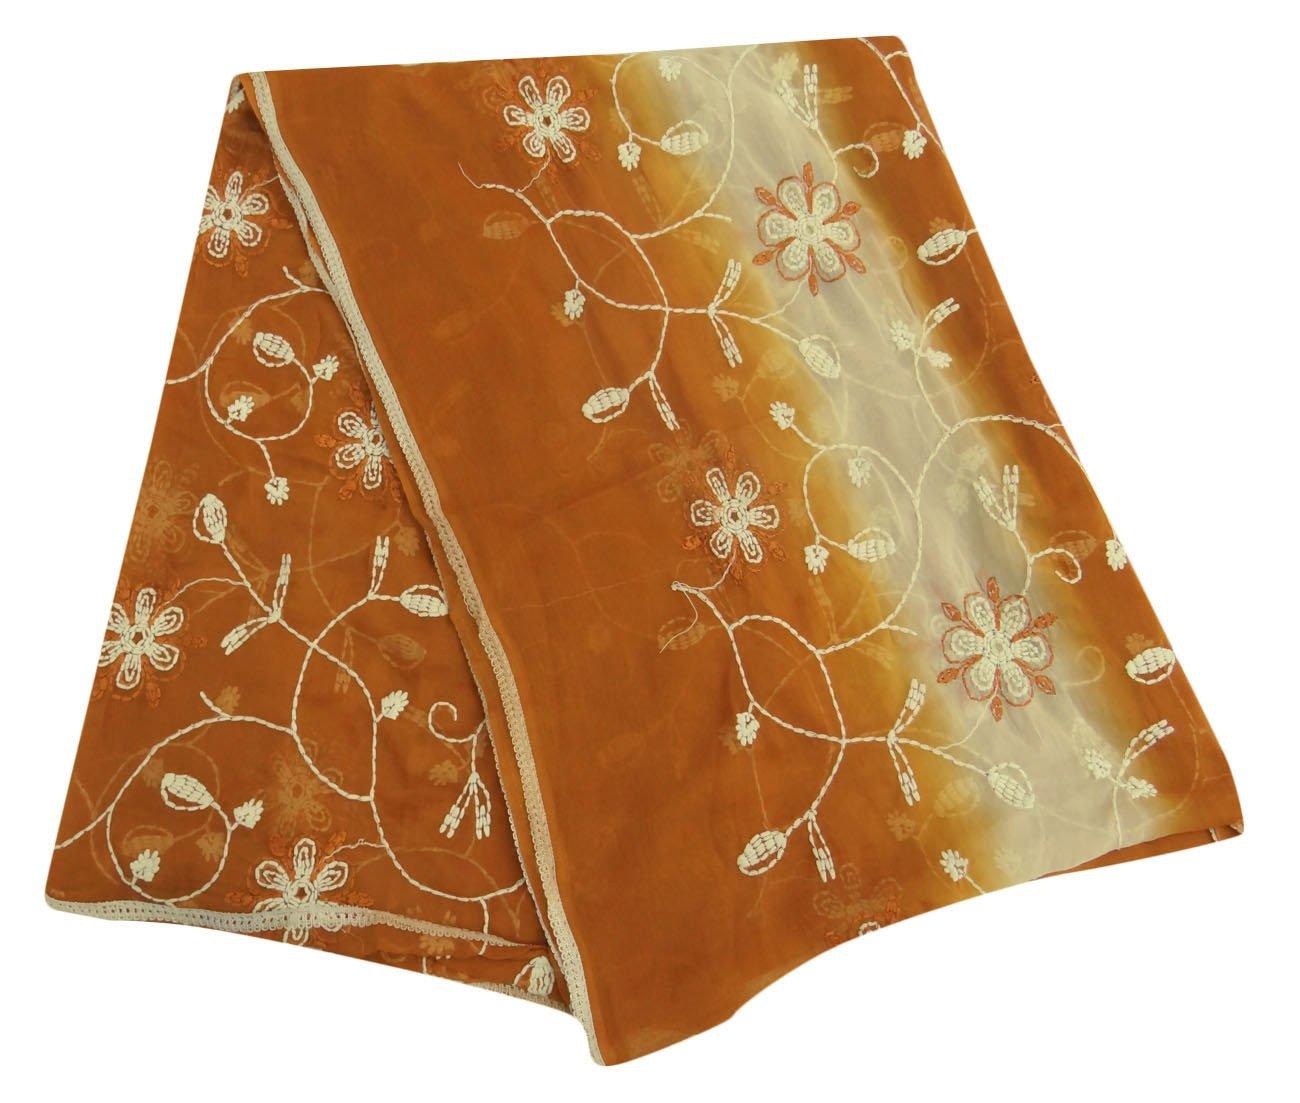 Vintage Dupatta Long Indian Scarf Embroidered Fabric Antique Brown Veil Stole Vintageandyou